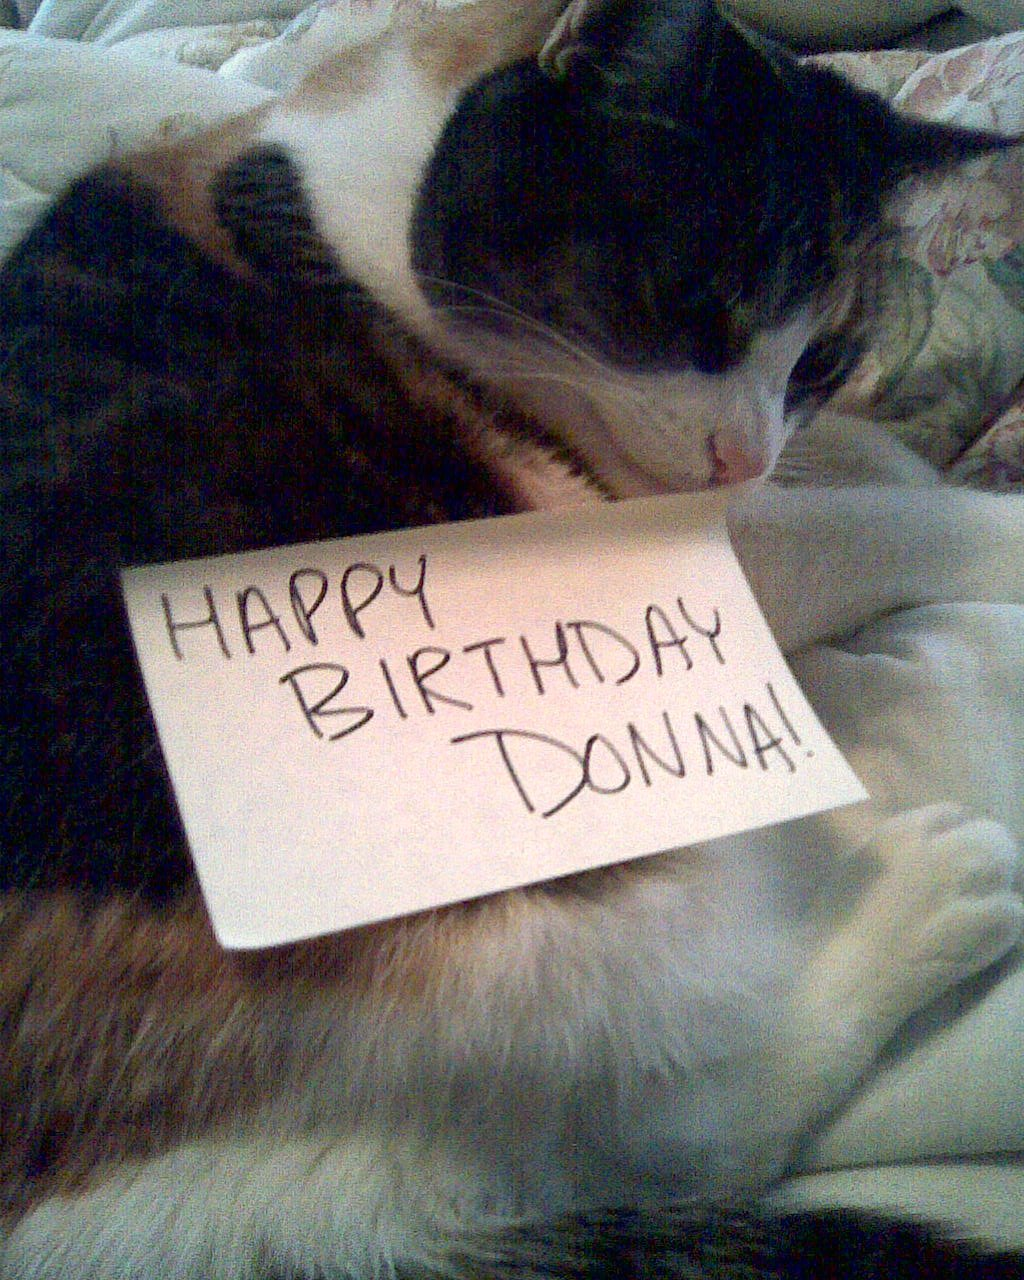 Happy Birthday To Donna!